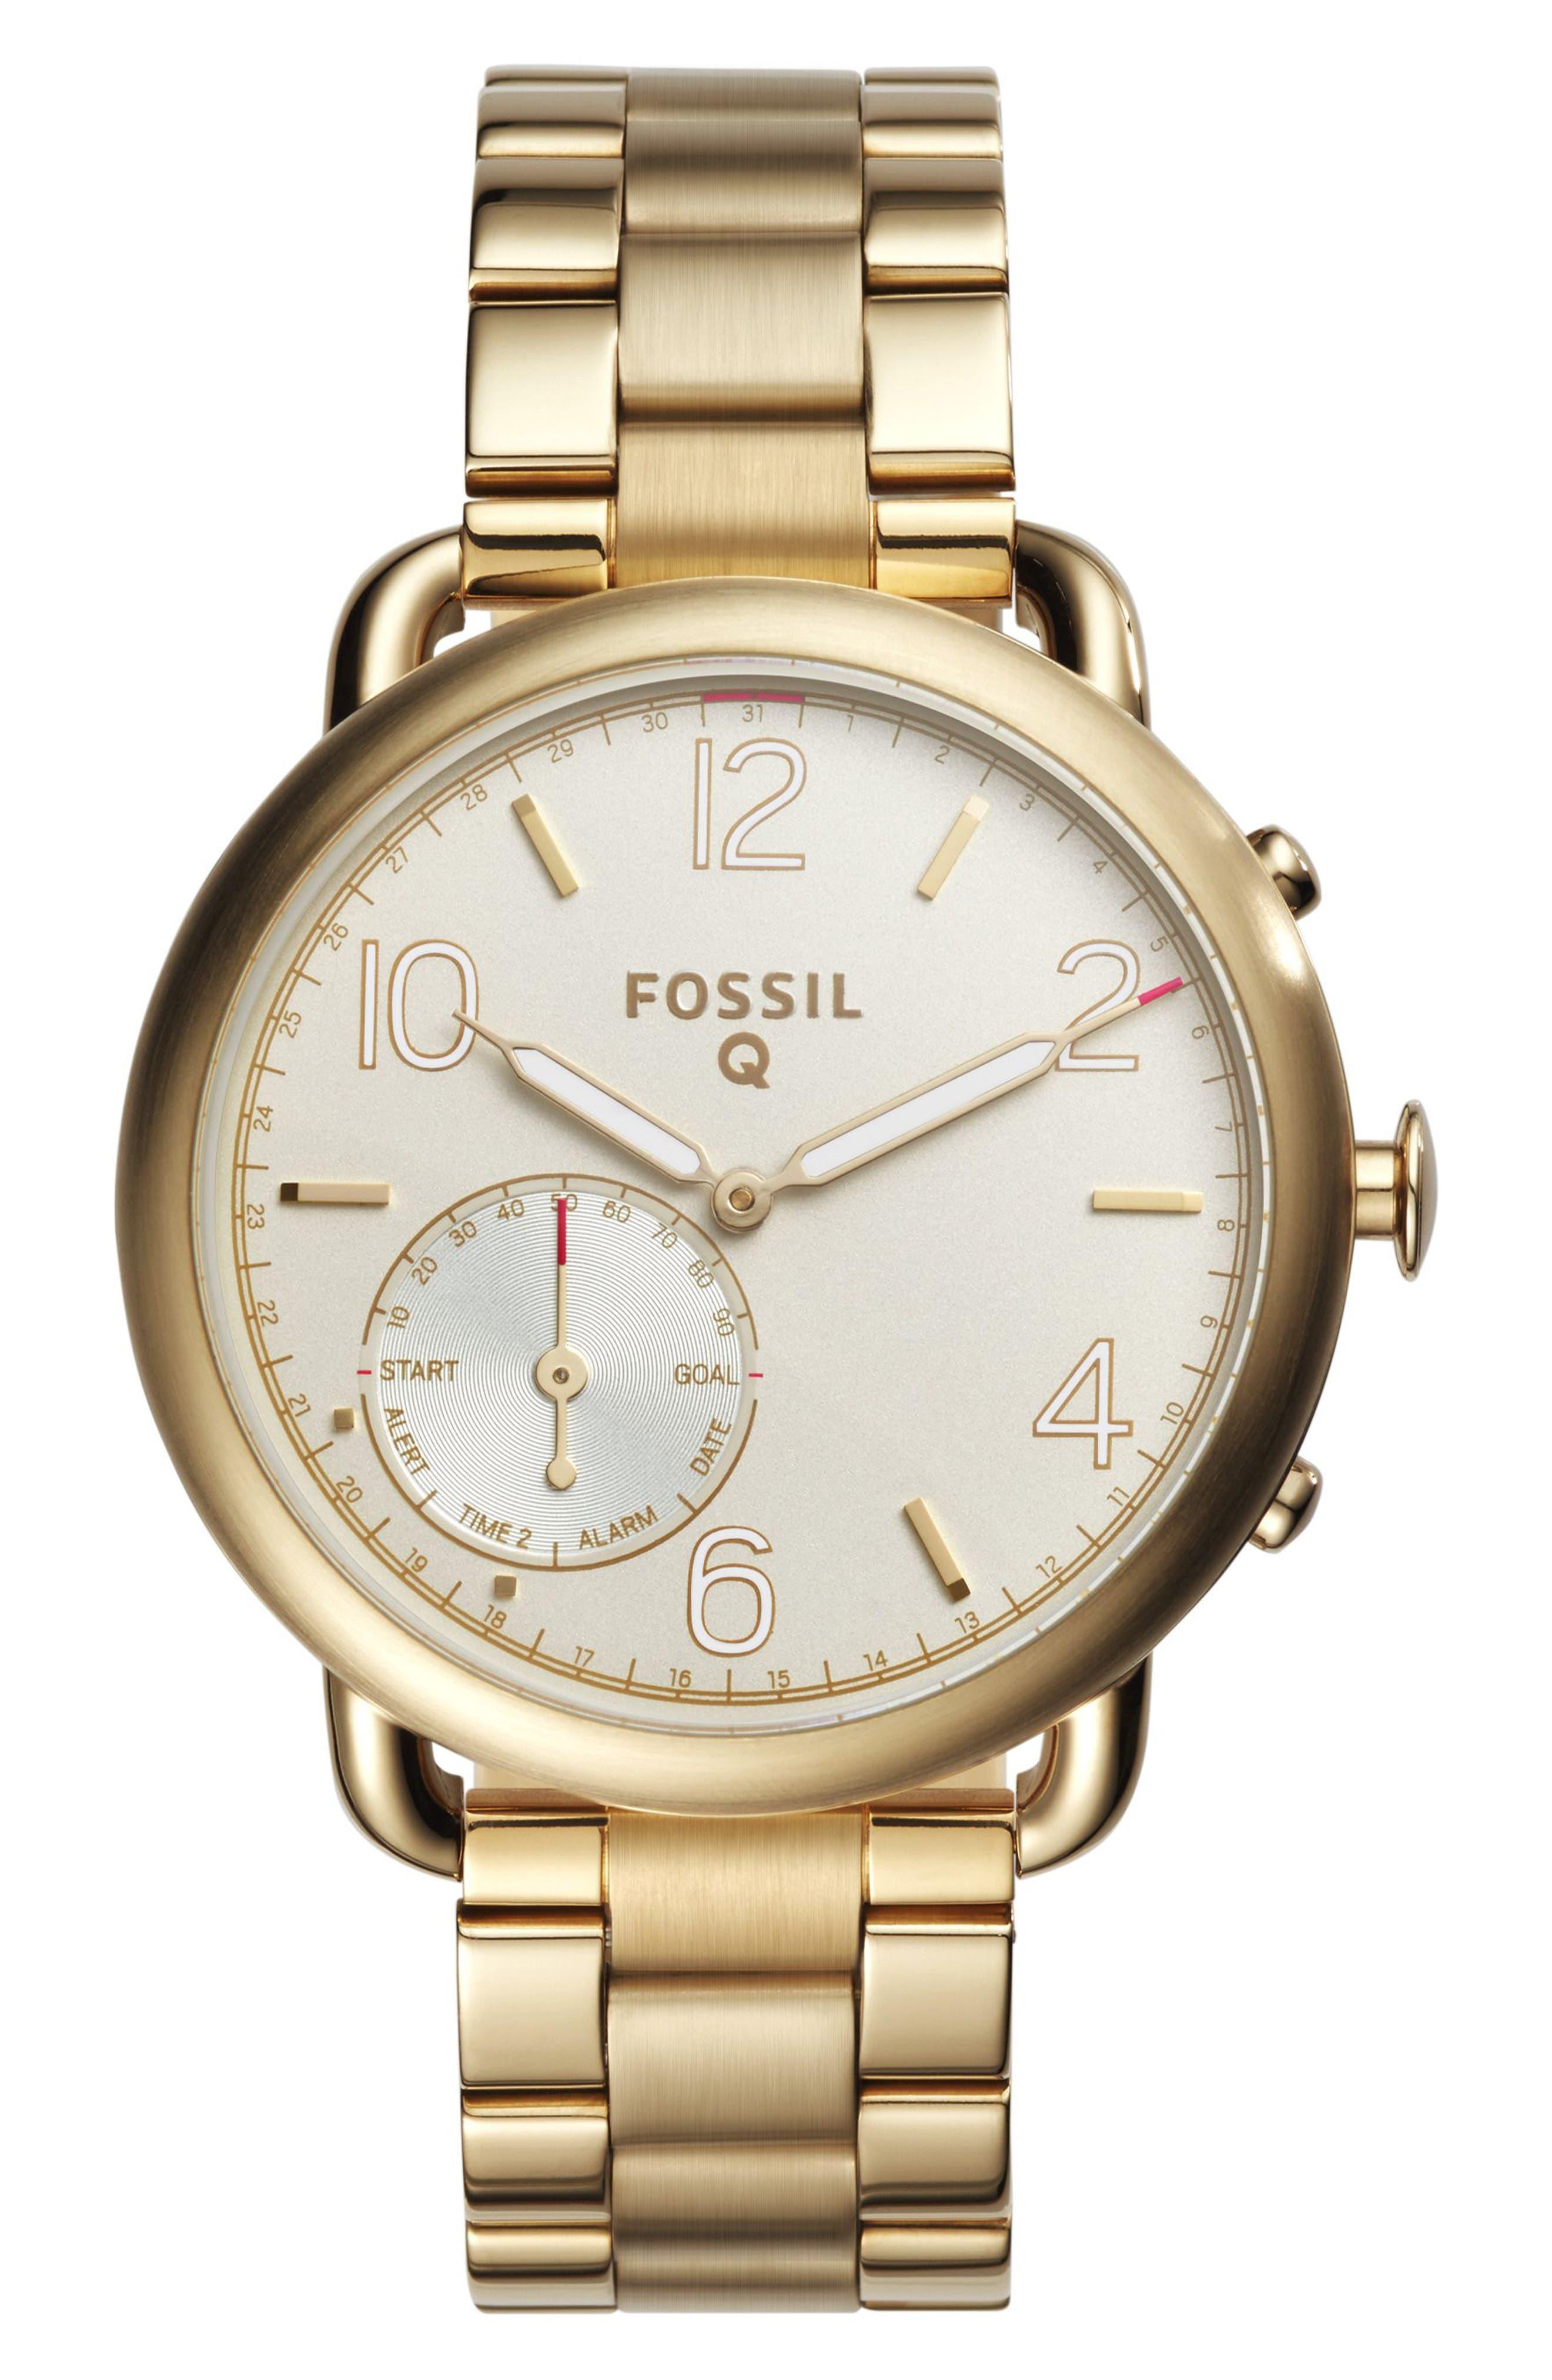 Fossil Q Tailor Smart Bracelet Watch, 40mm